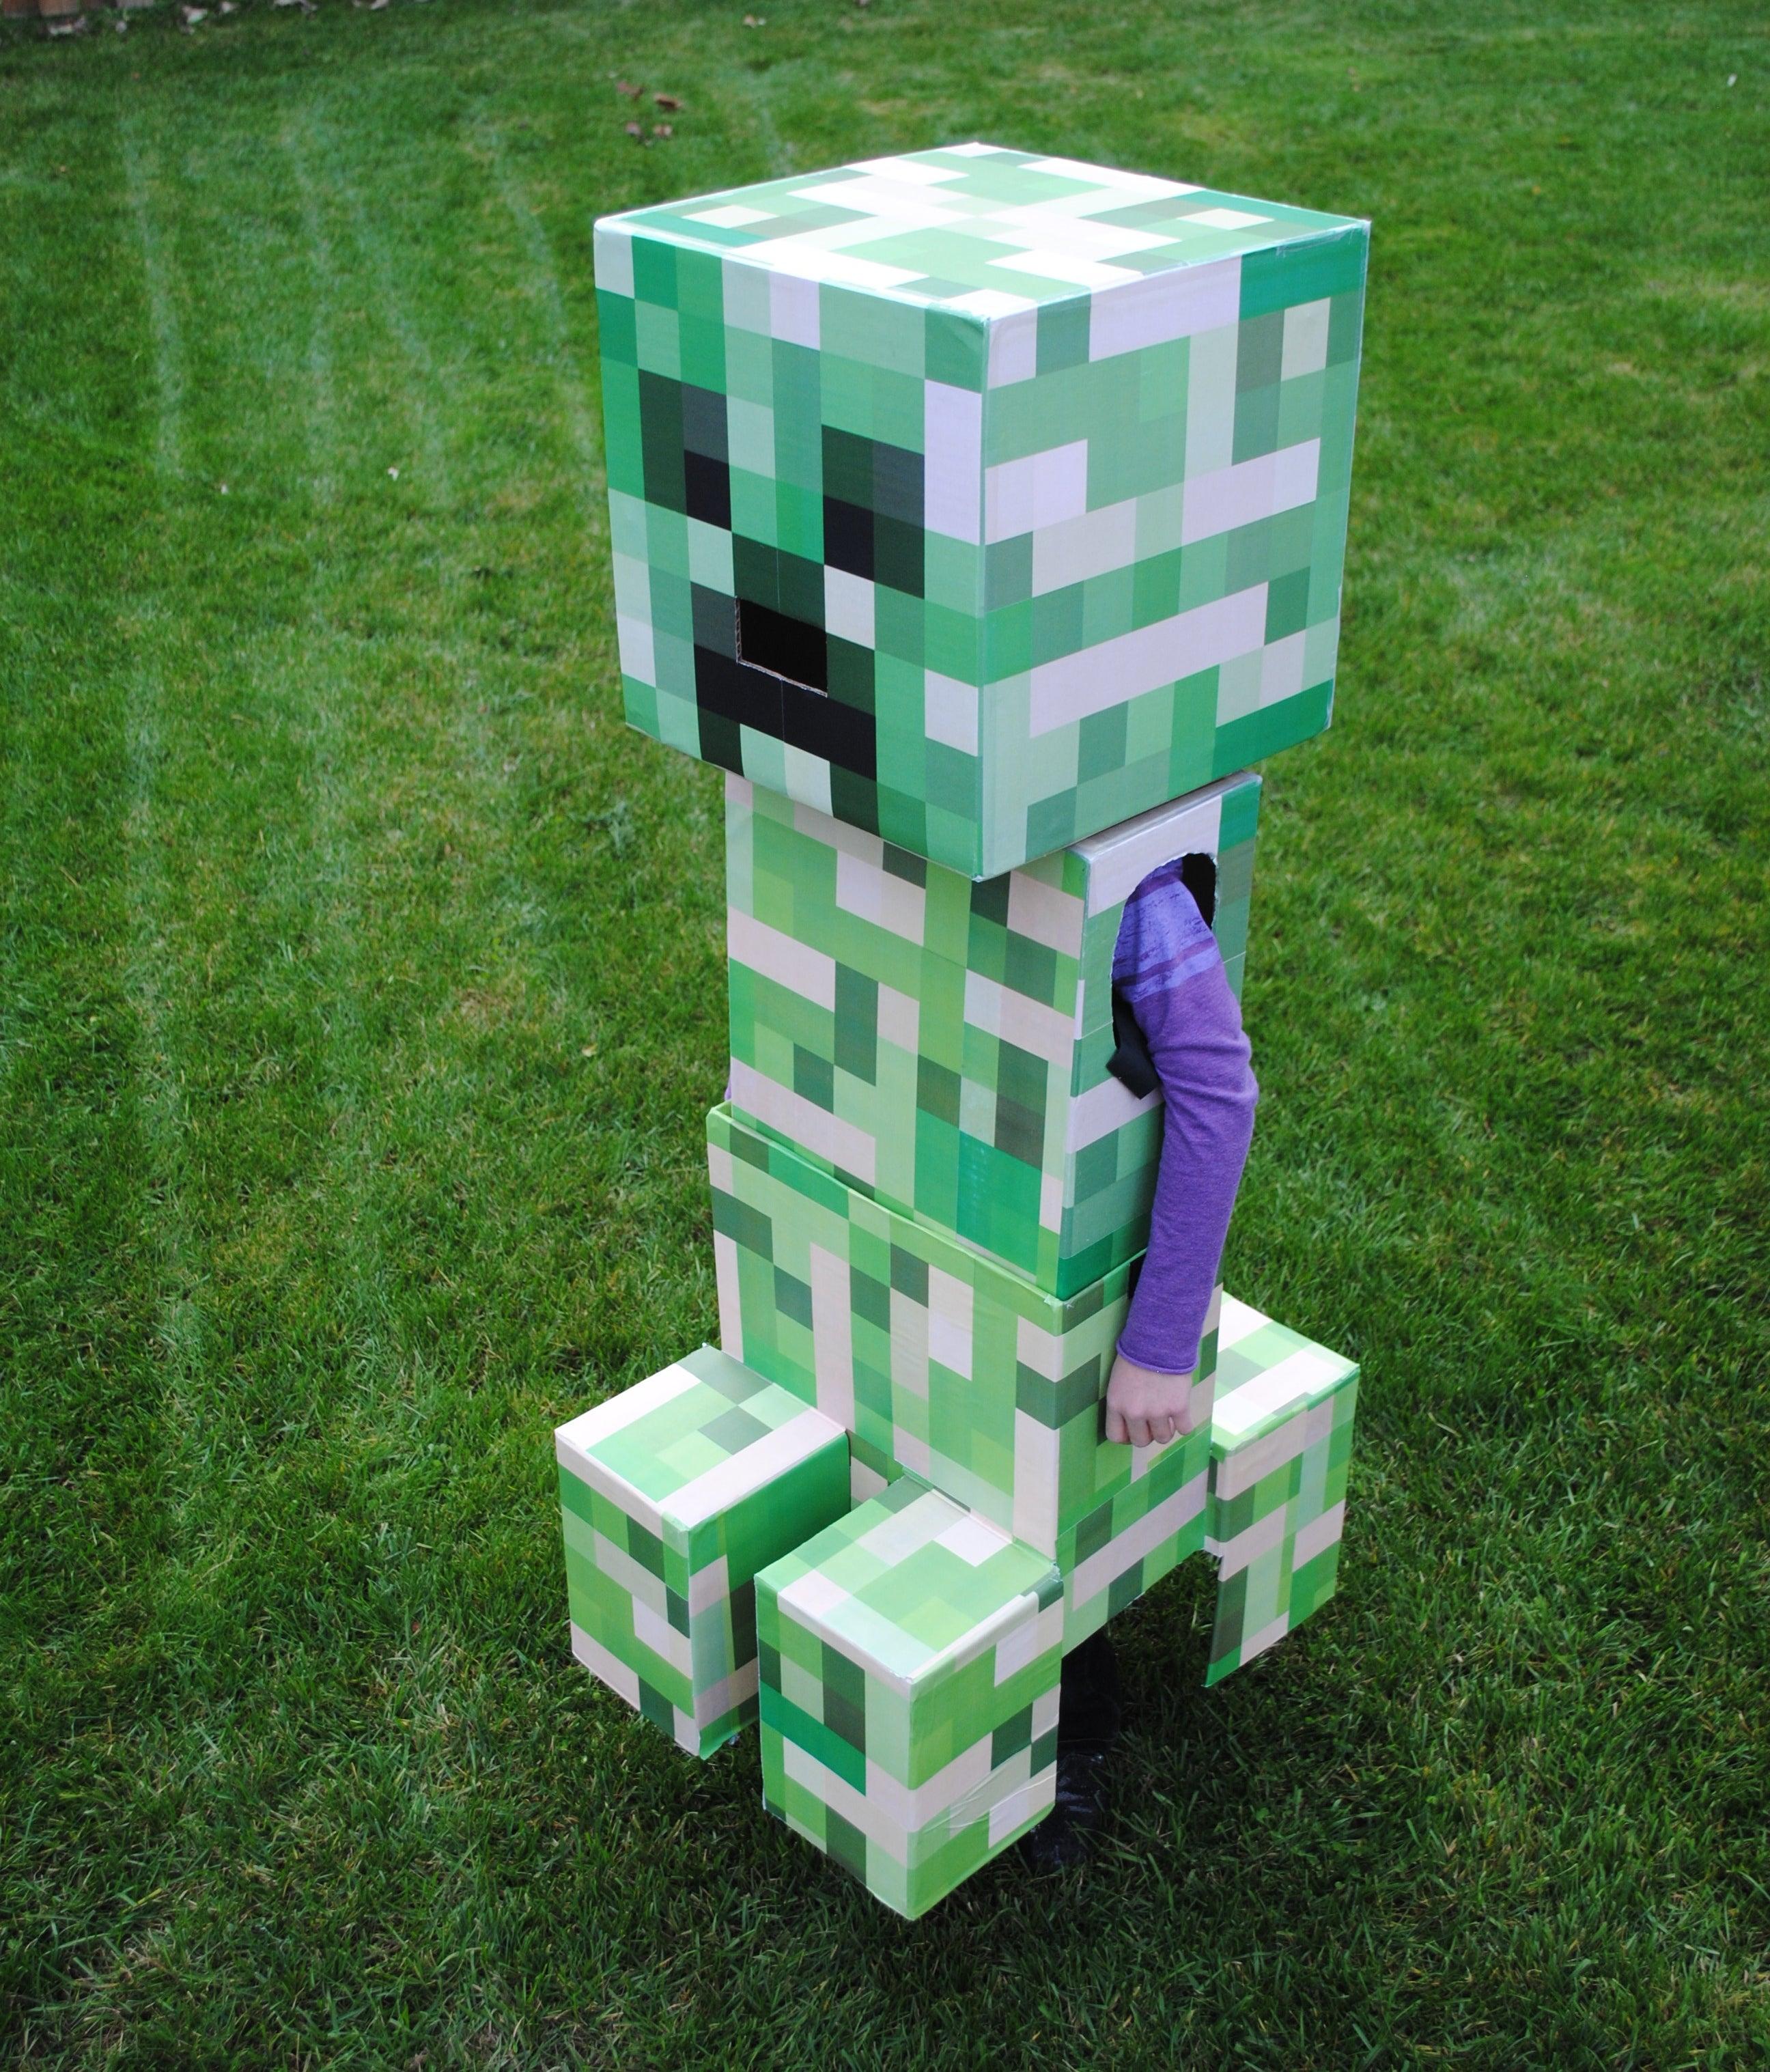 Creeper Minecraft Paper Craft Model | Free Printable Papercraft ... | 3034x2592